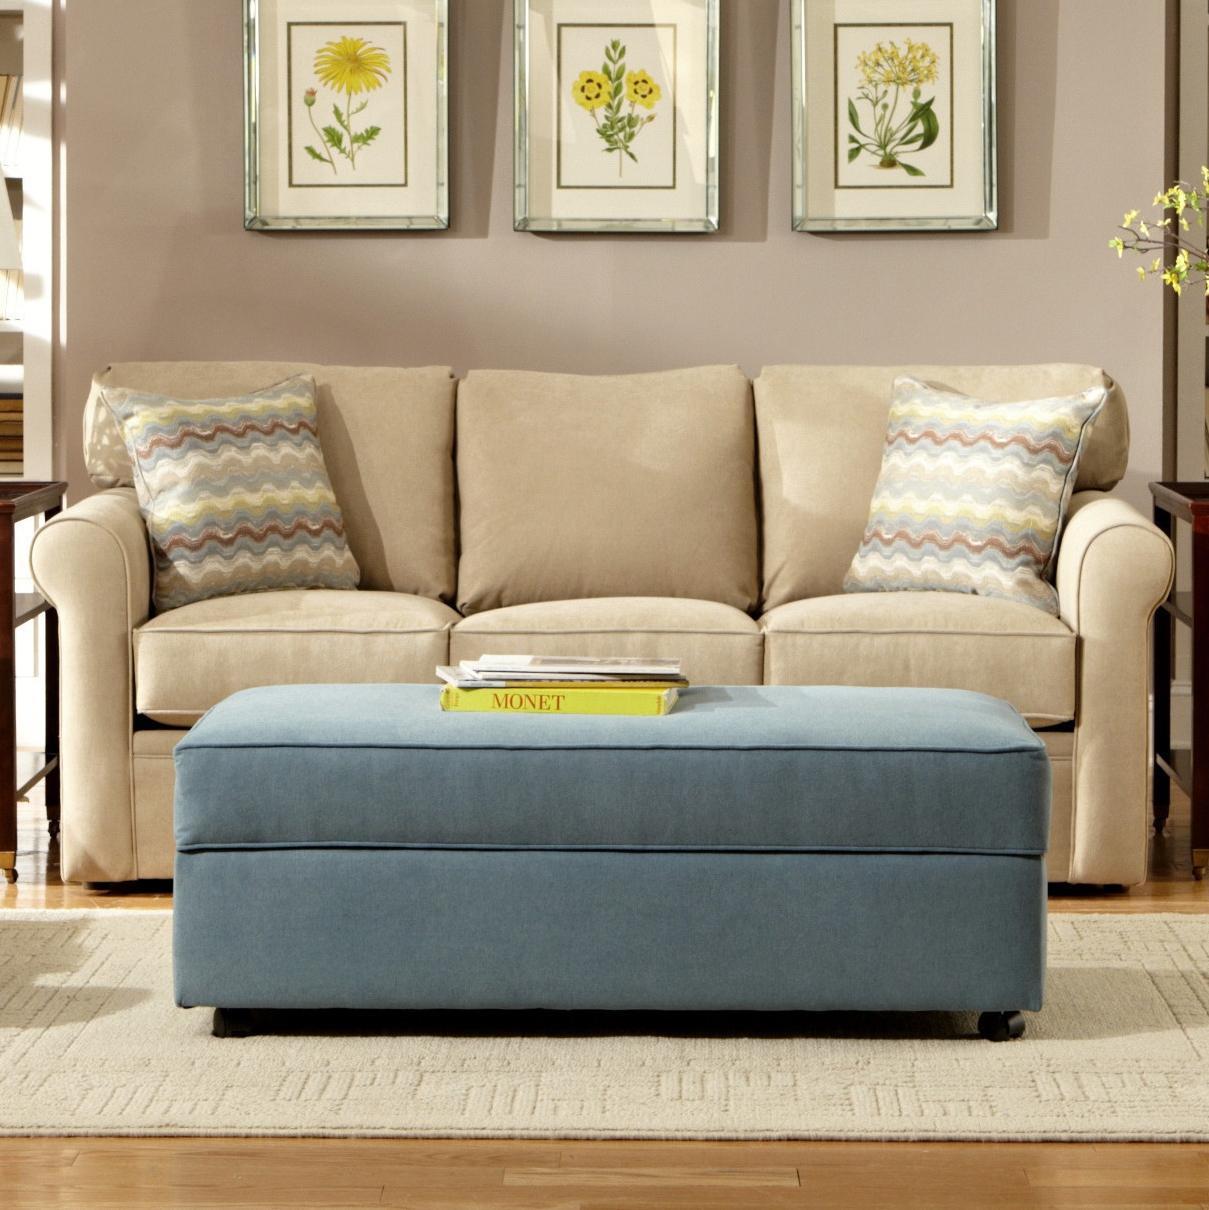 48 Frame Full Sleeper by Overnight Sofa at Dream Home Interiors